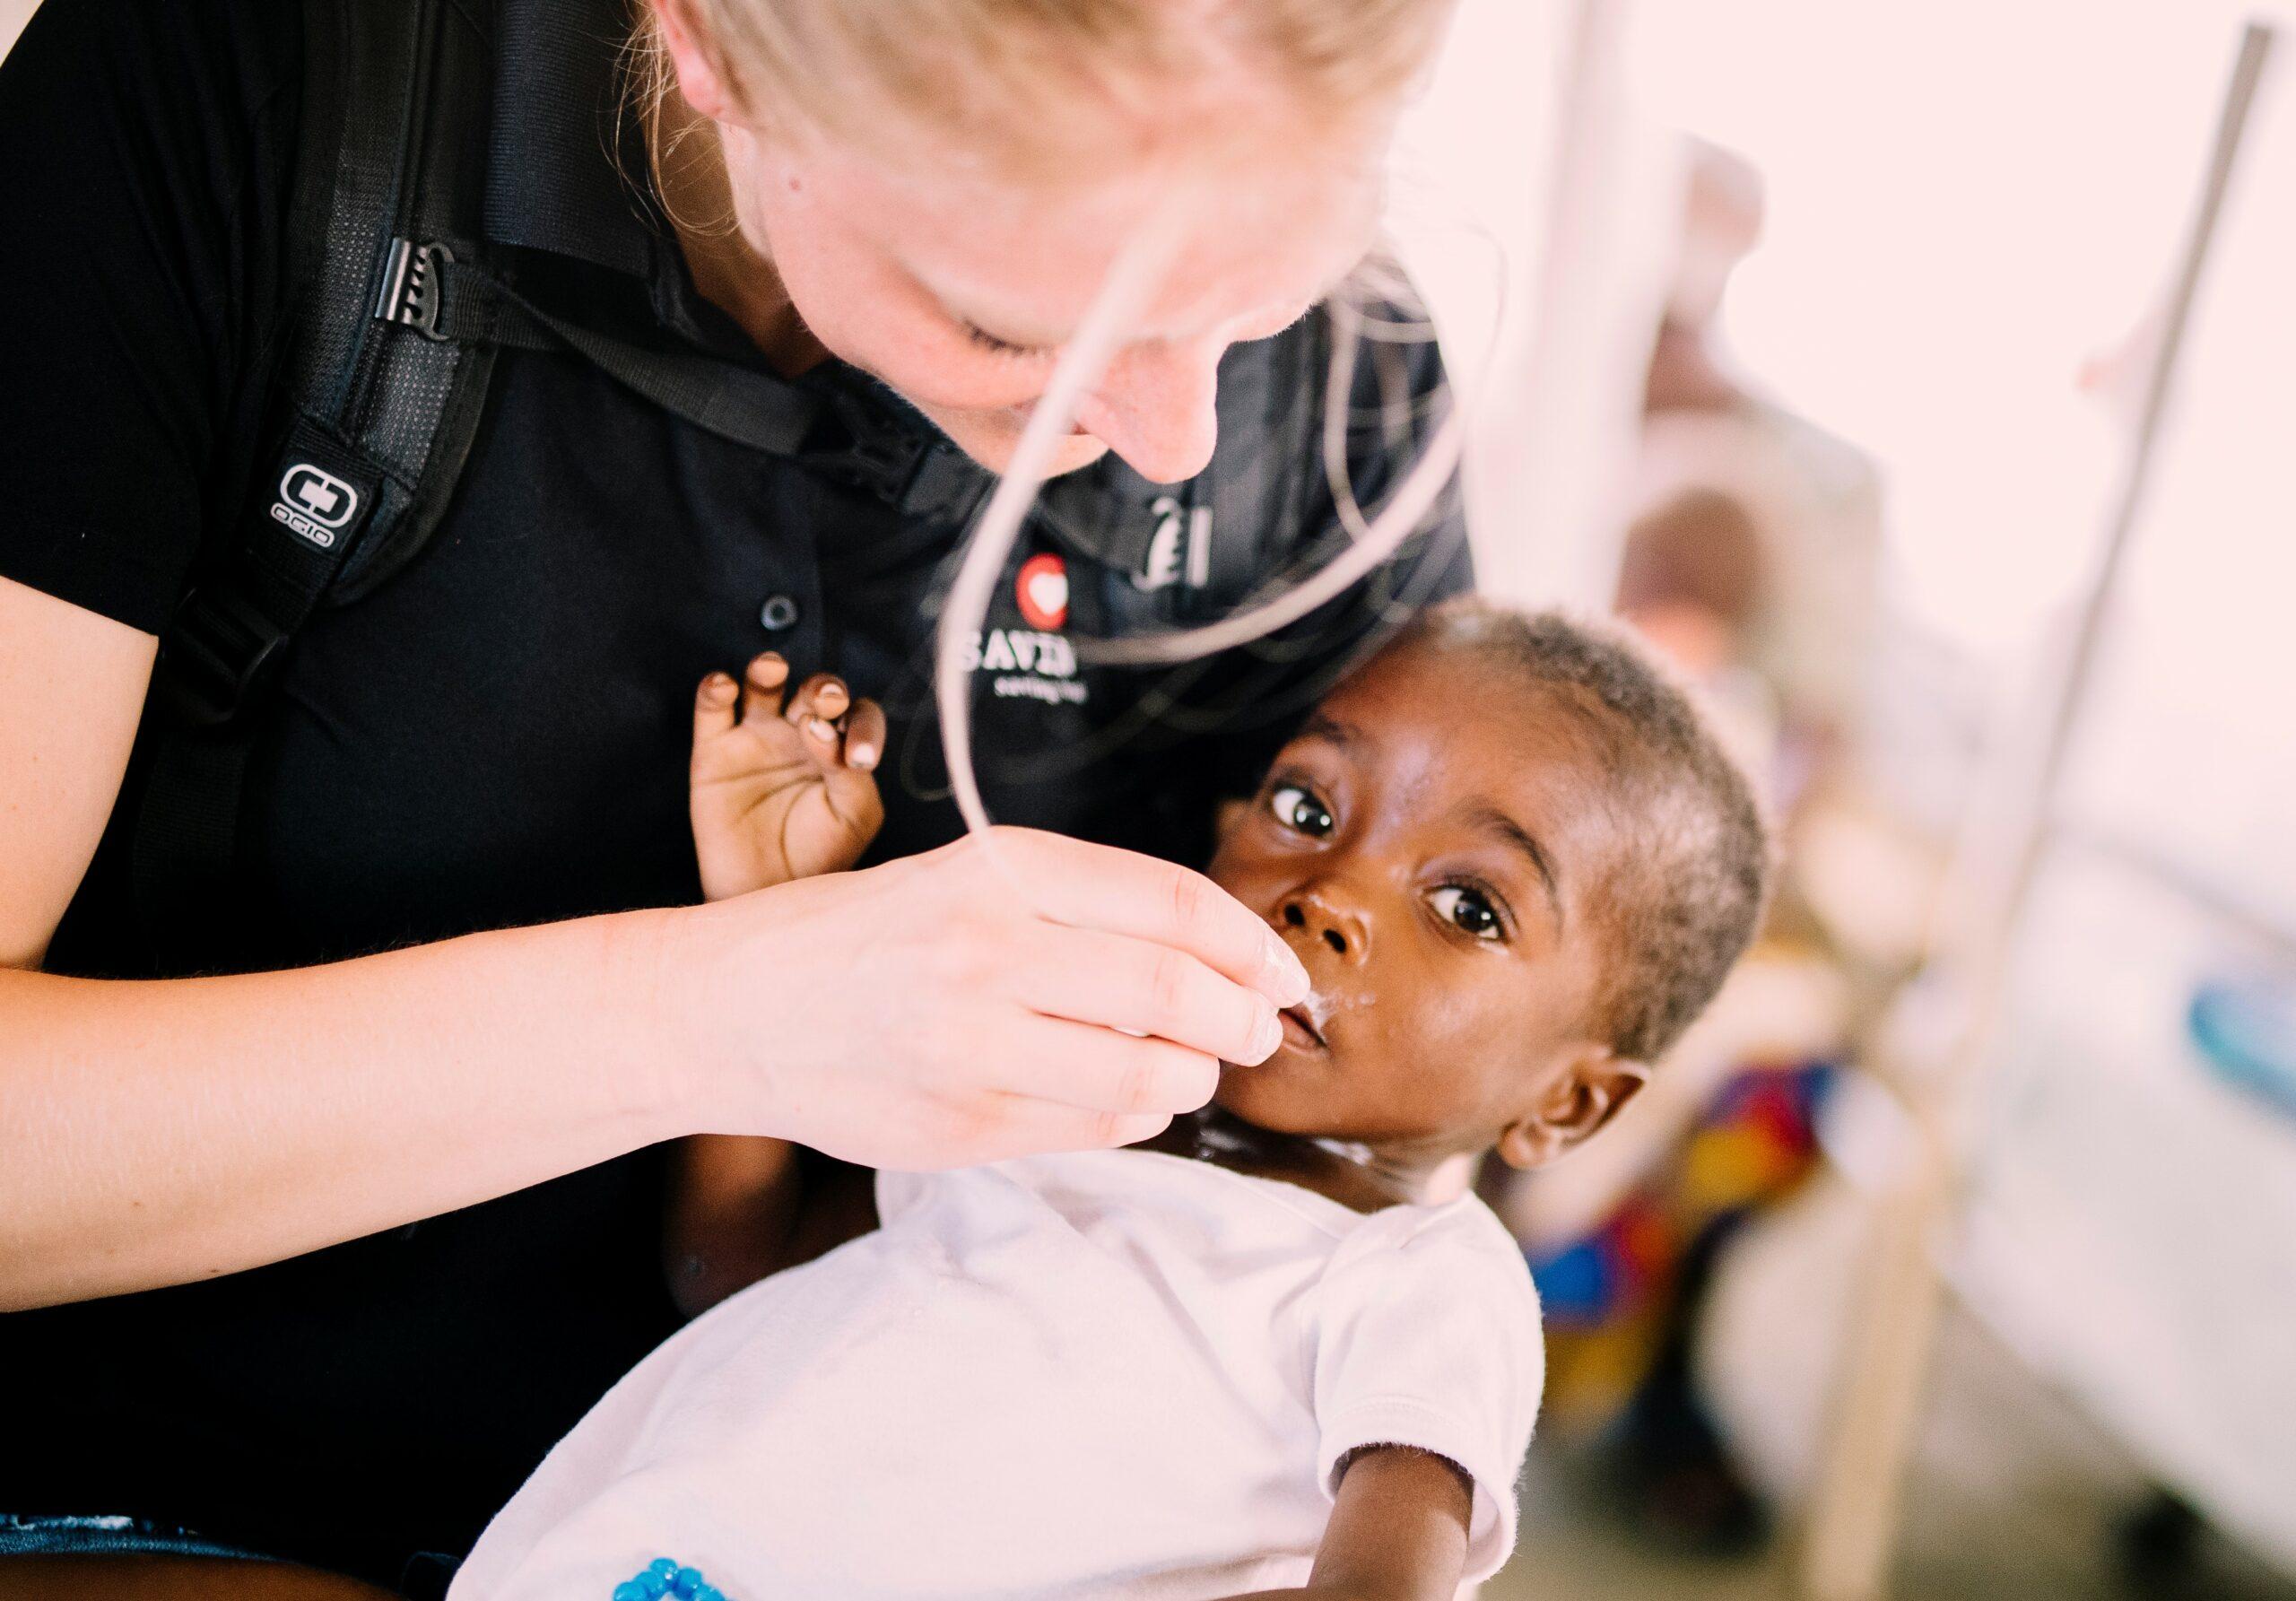 Humanitarian Aid - Executive Director, Heidi, feeding a baby in Angola.